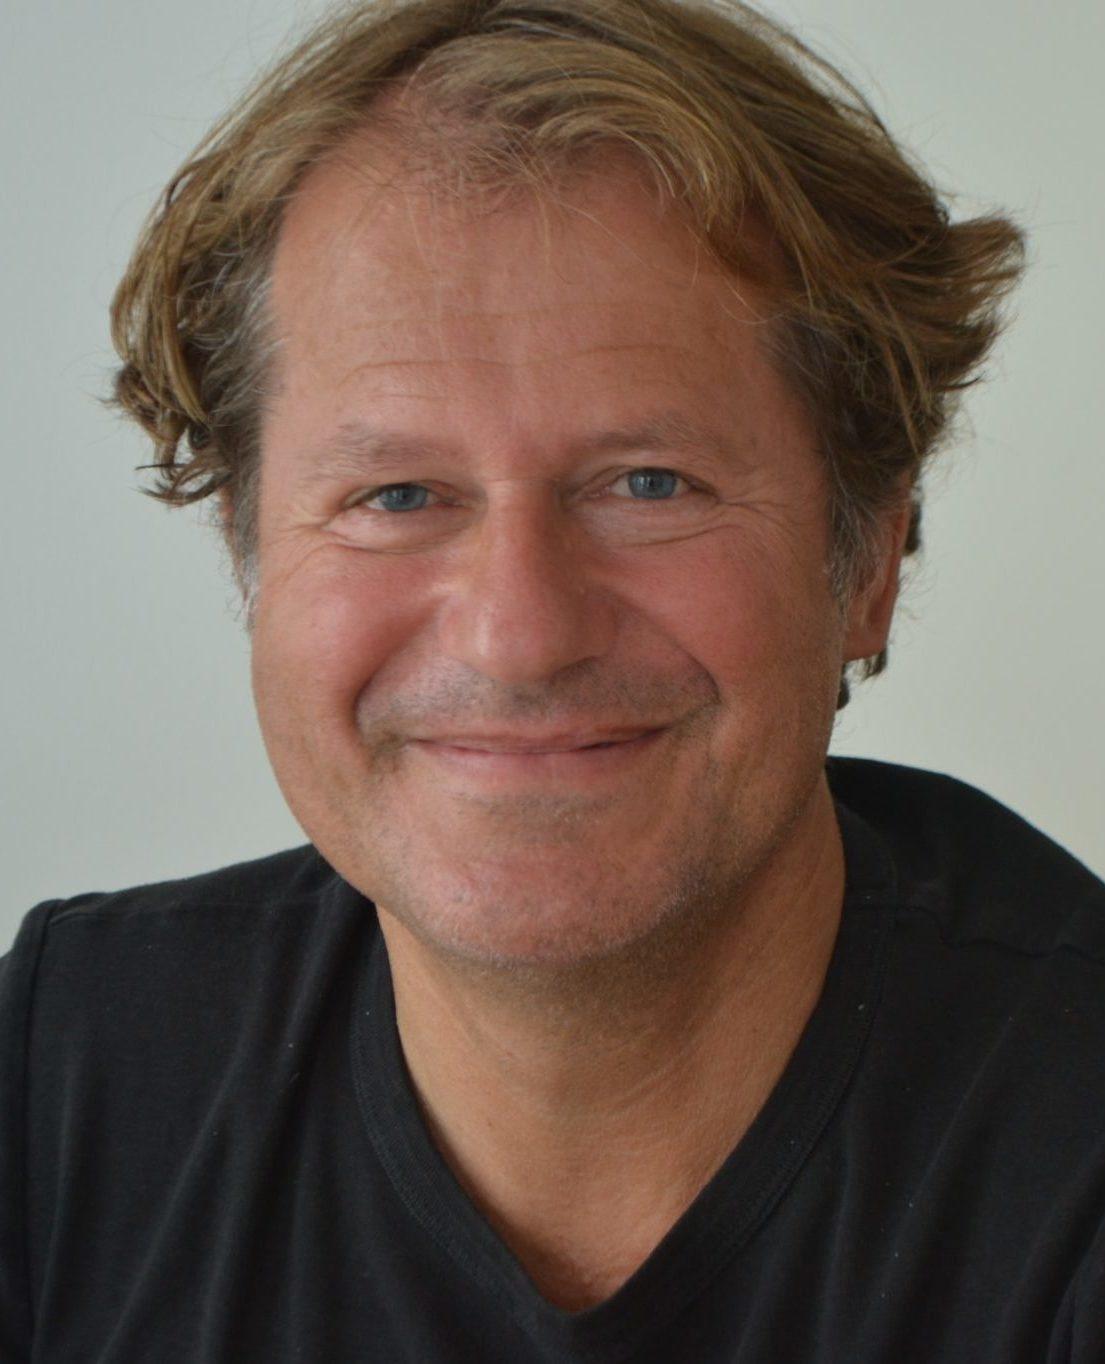 Andreas Aebi